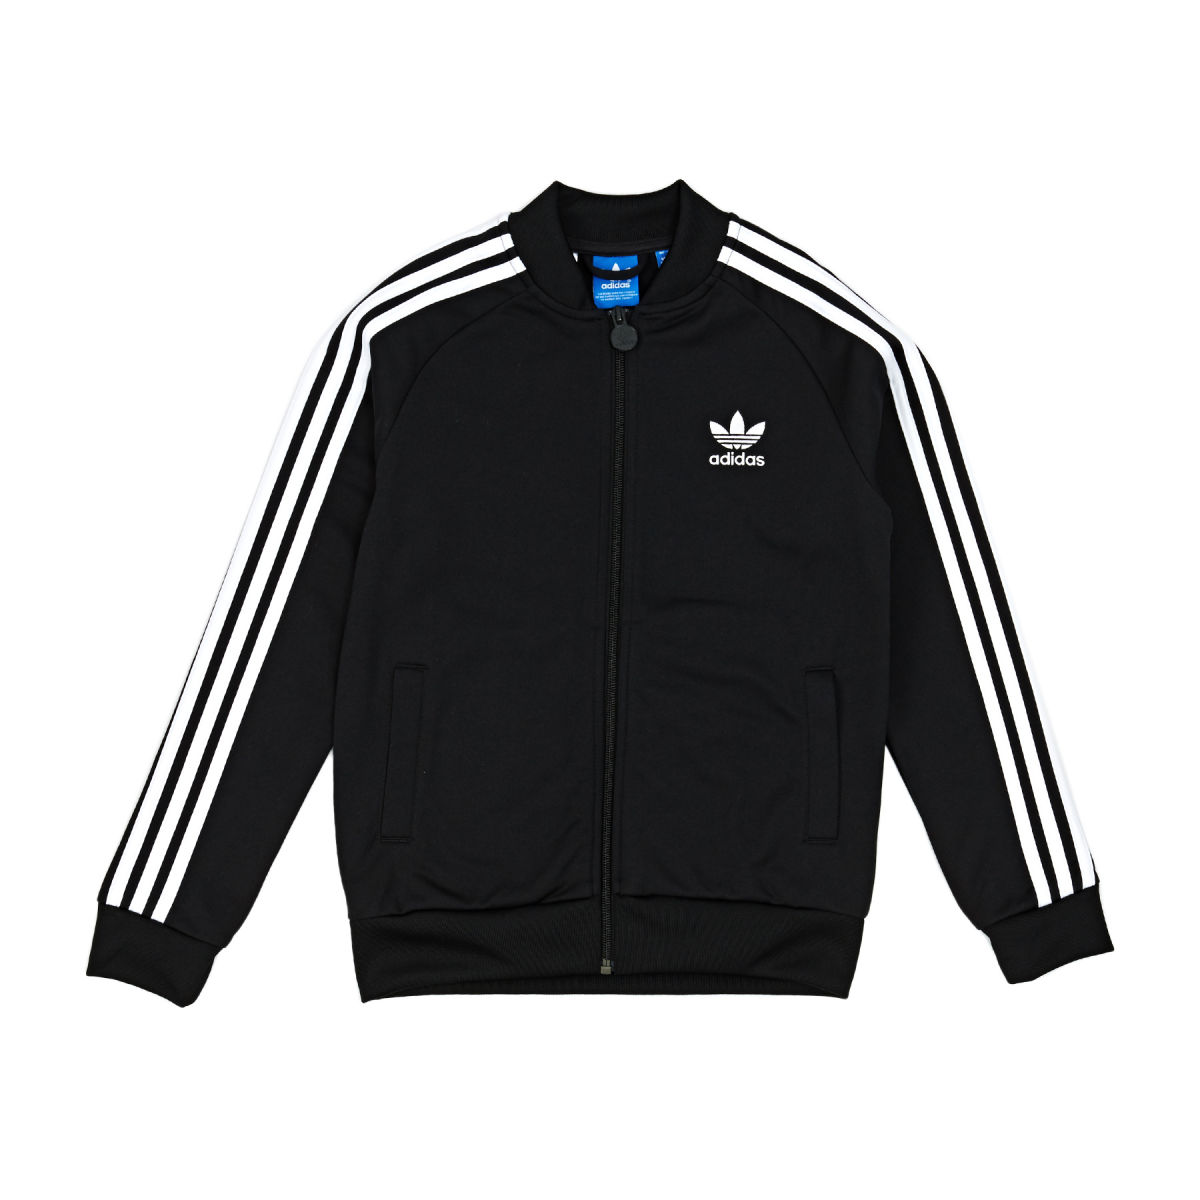 adidas originals jacket adidas originals superstar jacket - black/white VBOIWZJ